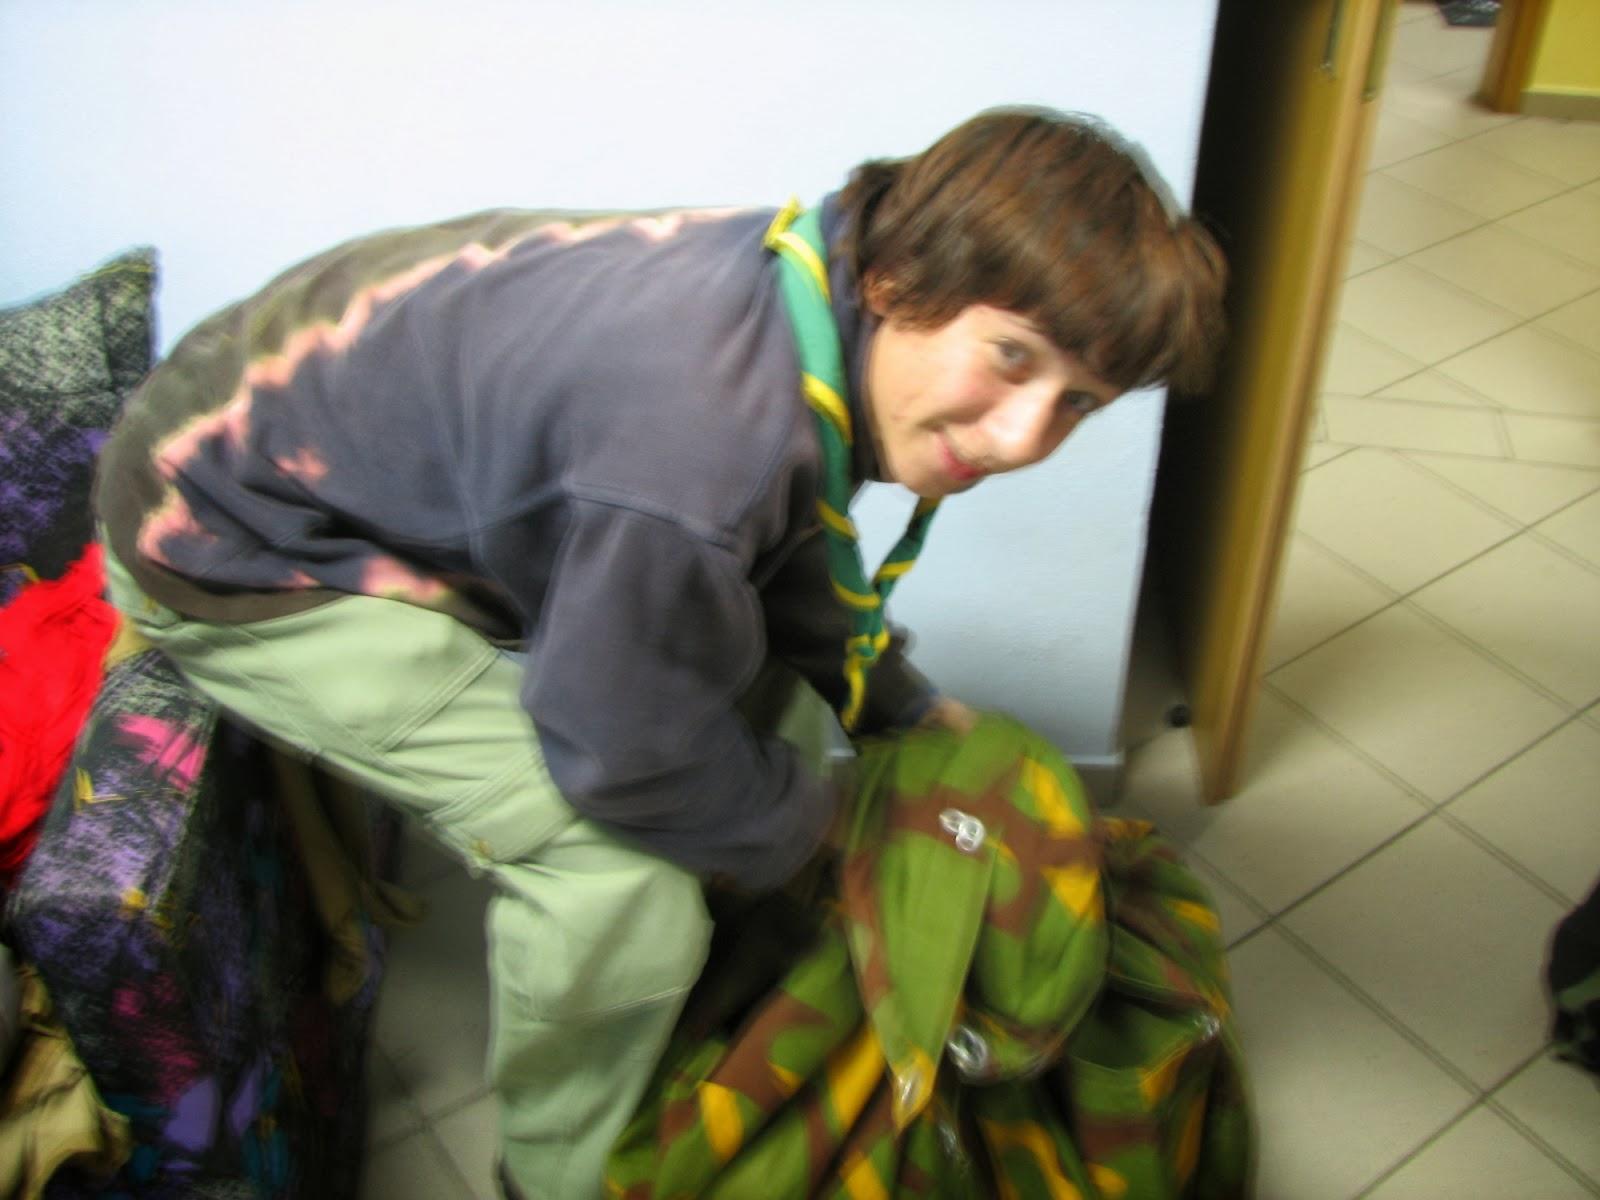 Prehod PP, Ilirska Bistrica 2005 - picture%2B017.jpg